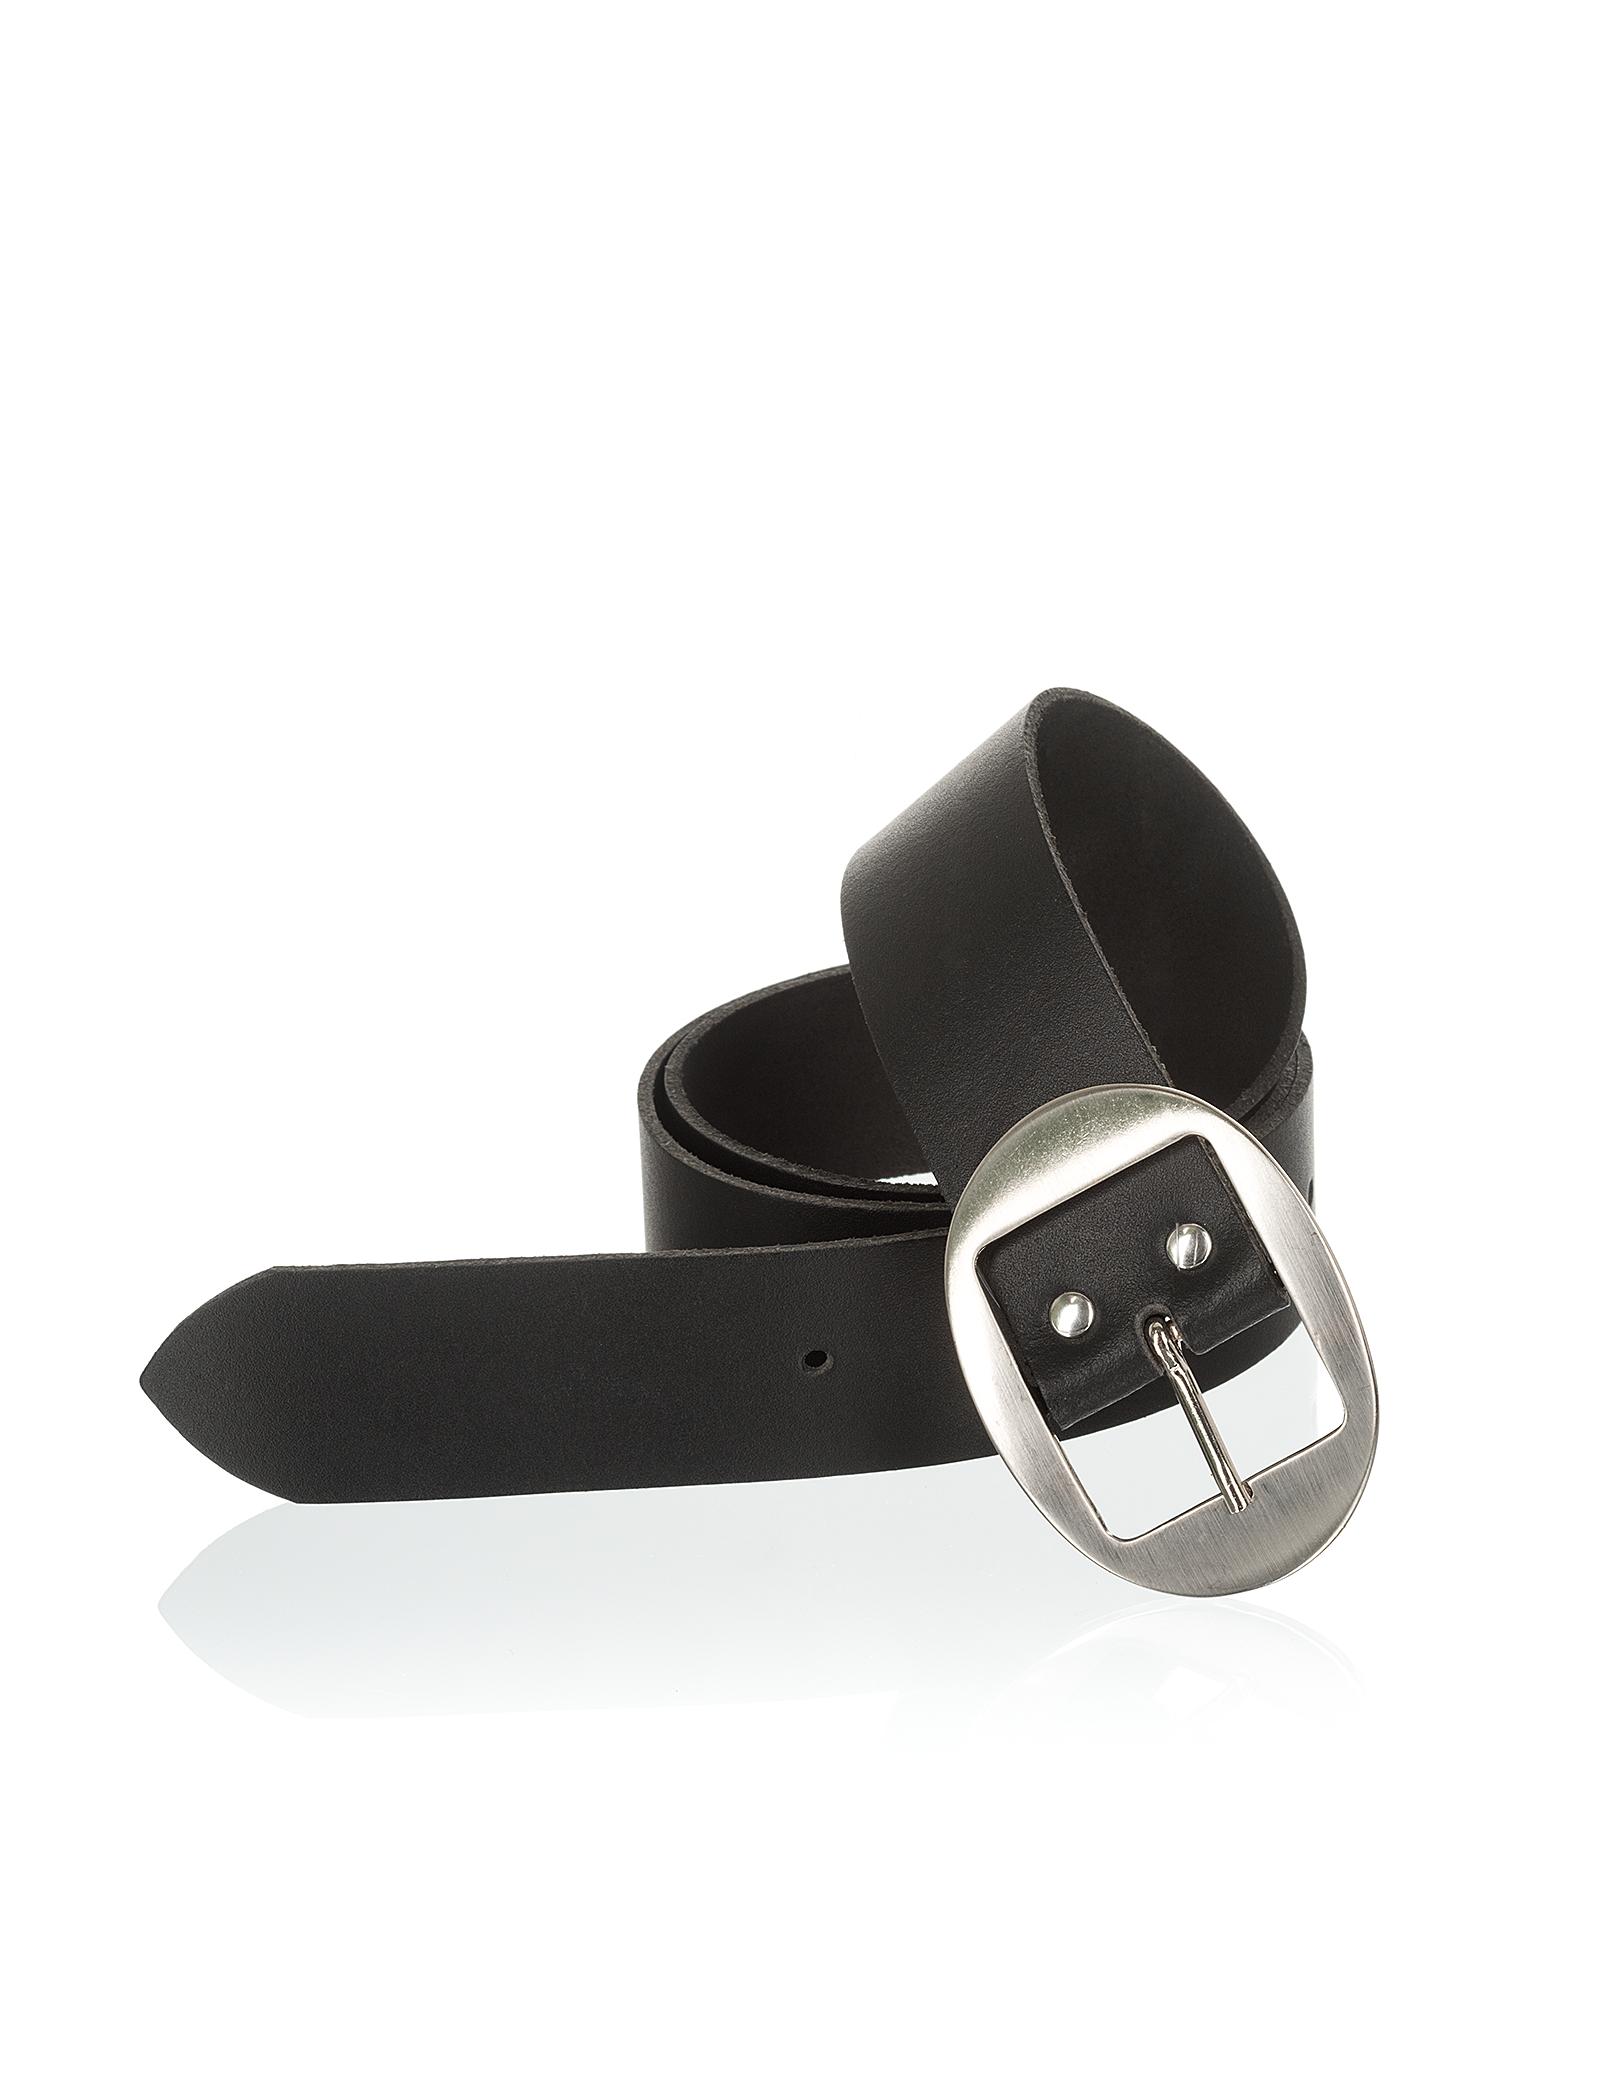 Guertel - Lazzarini Gürtel schwarz – Größe 10.0  - Onlineshop HUMANIC